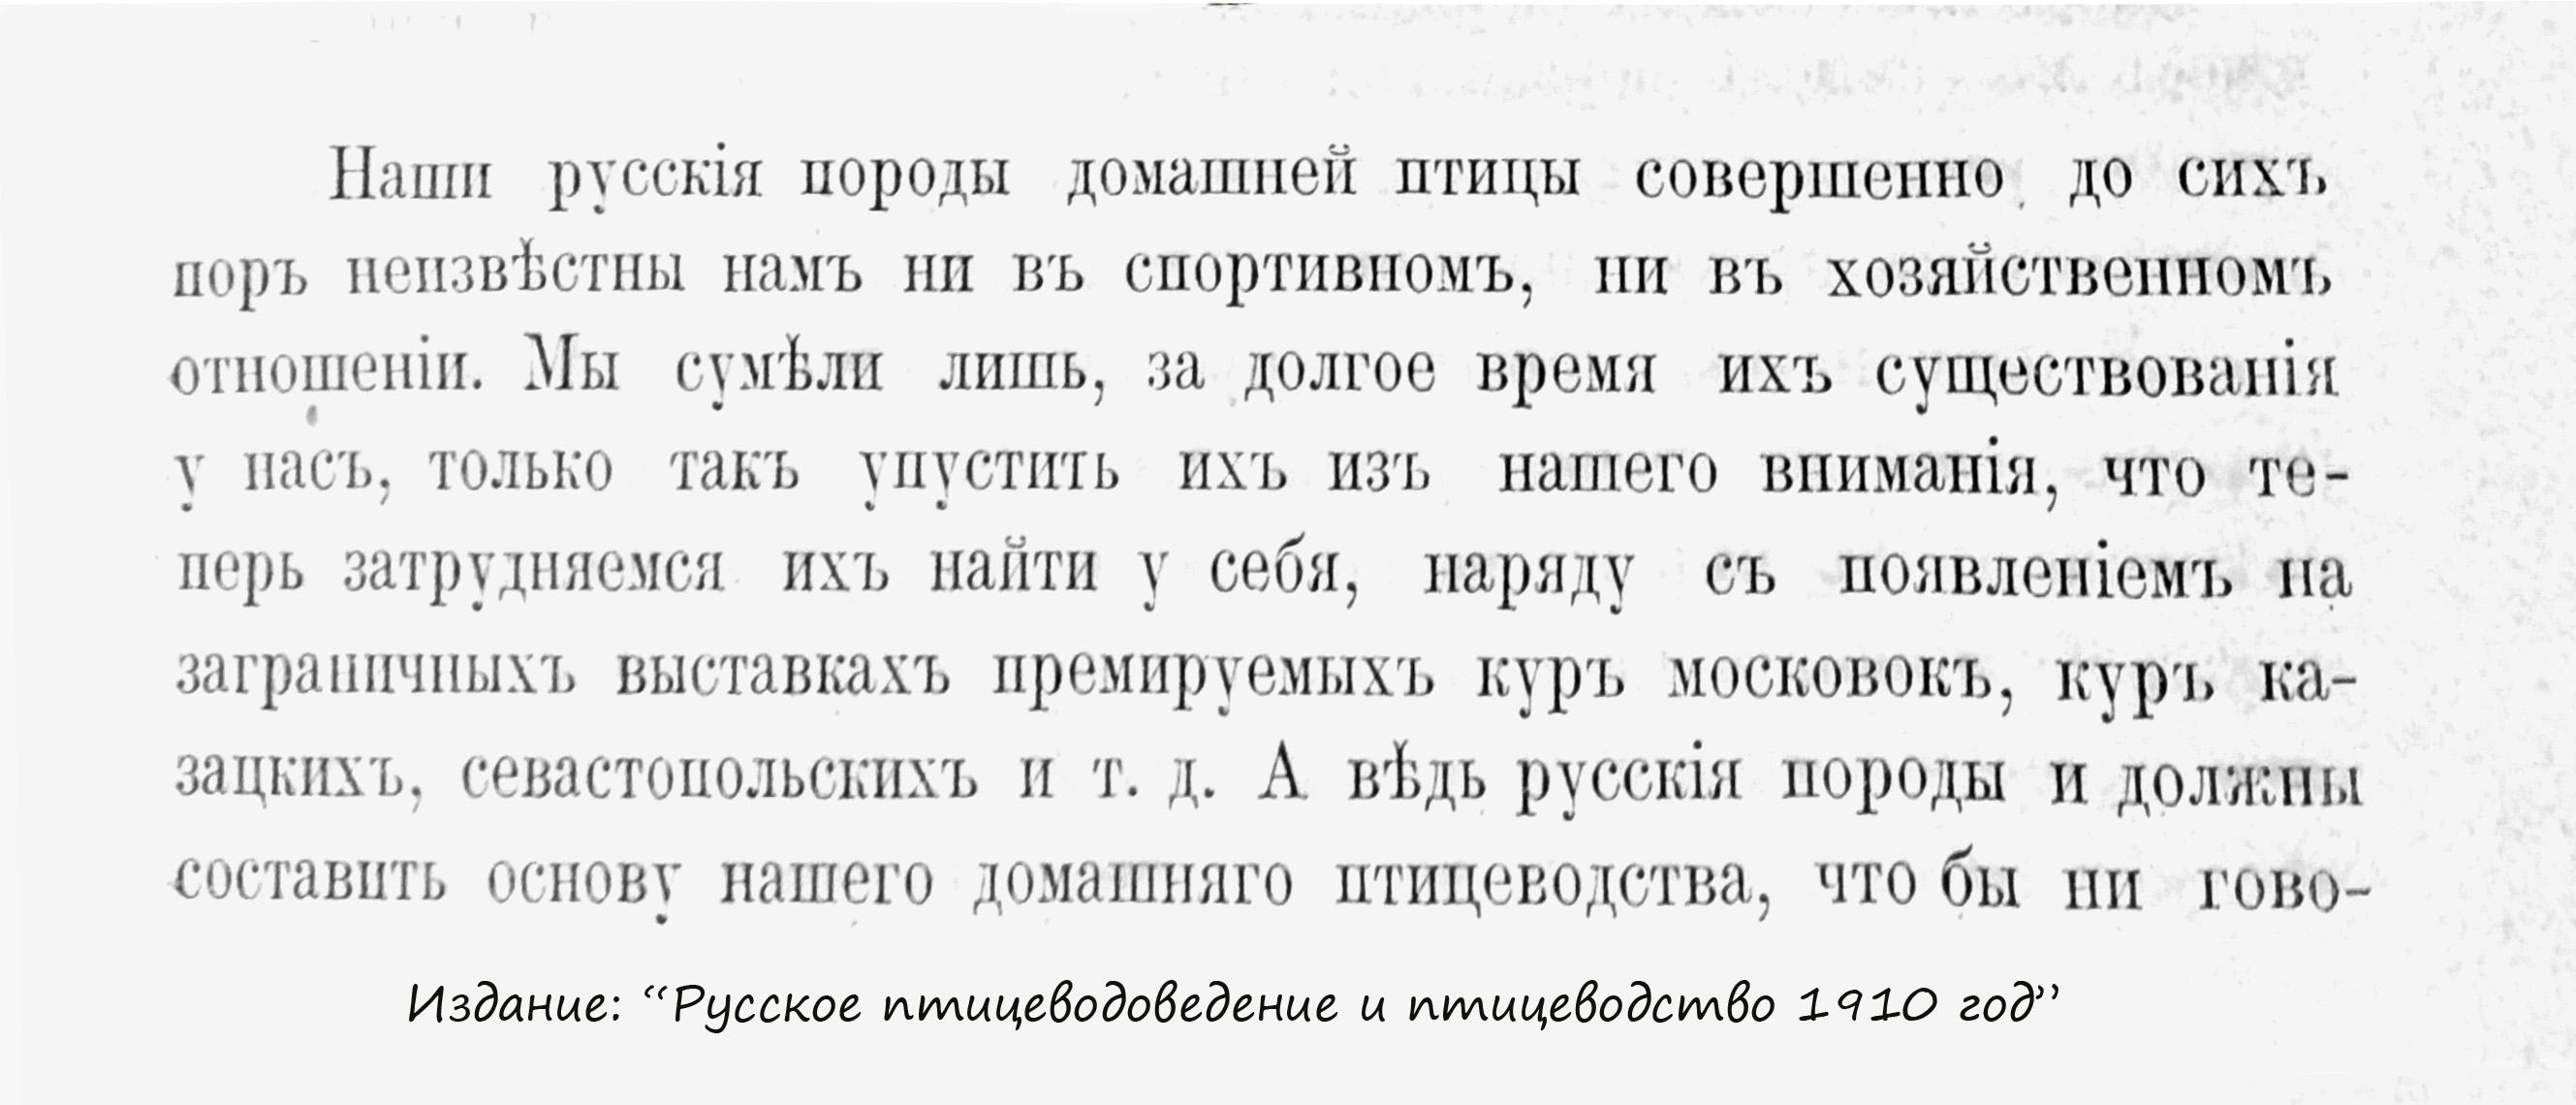 russkoepticevedenieipticevodstvo1910gkopiya1.jpg